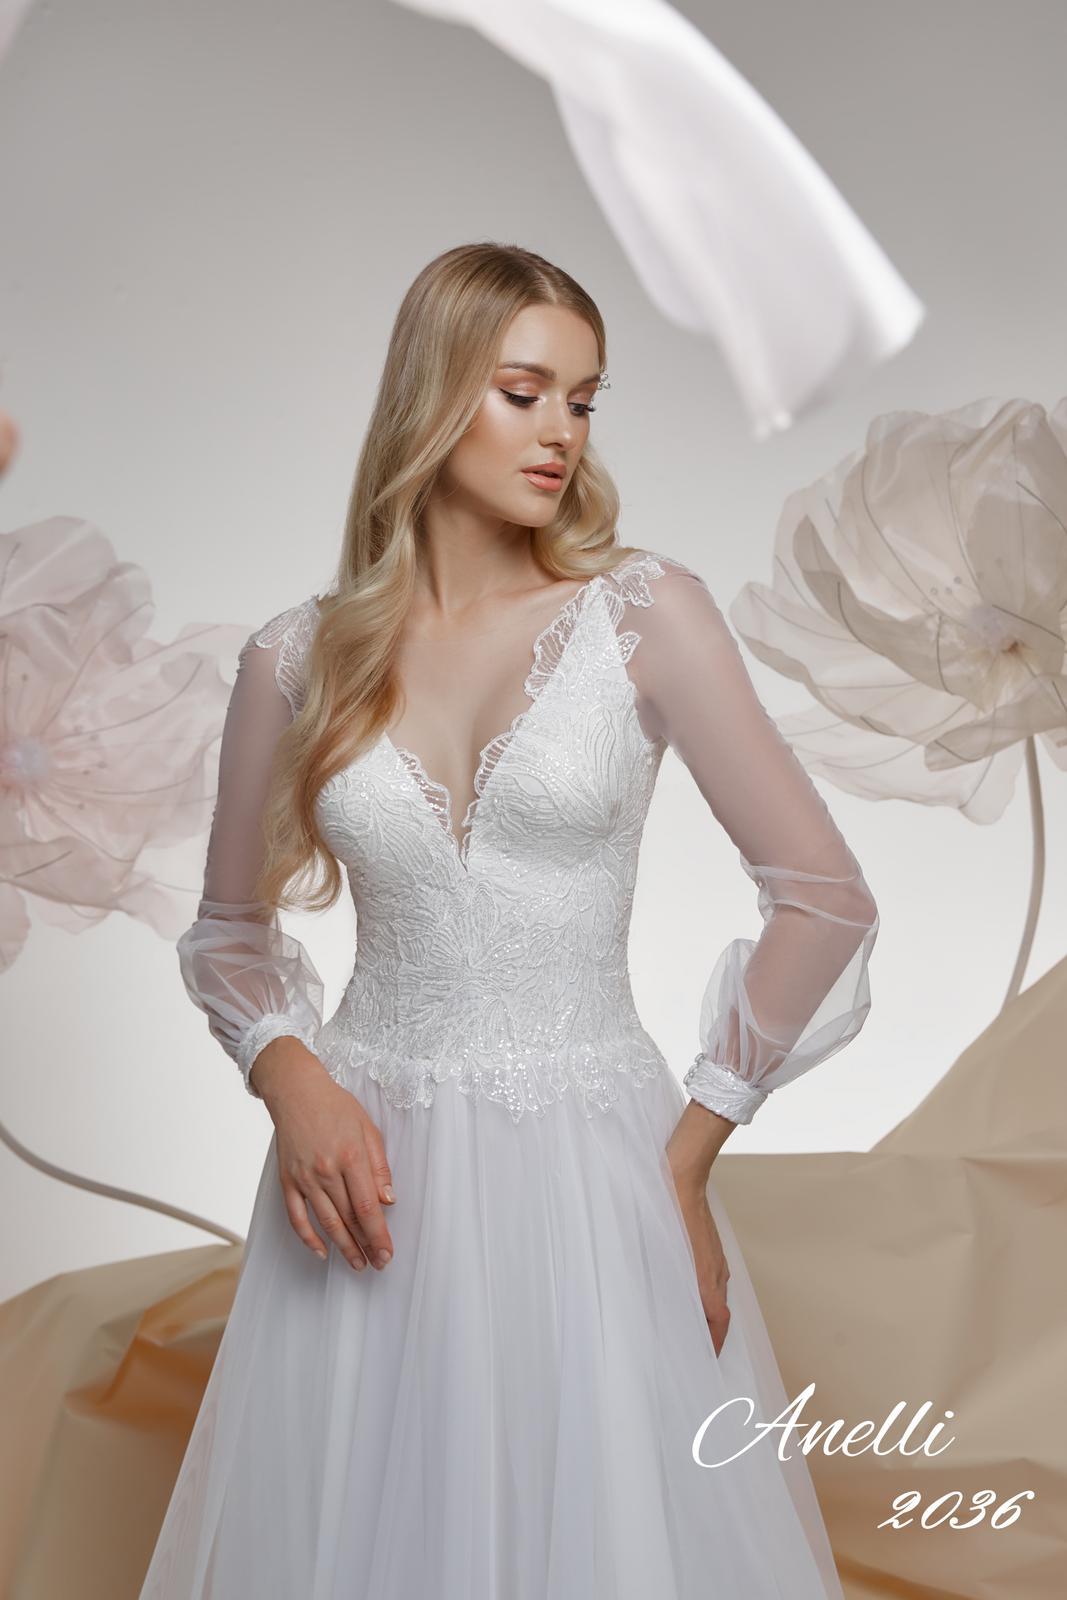 Svadobné šaty - Imagine 2036 - Obrázok č. 2